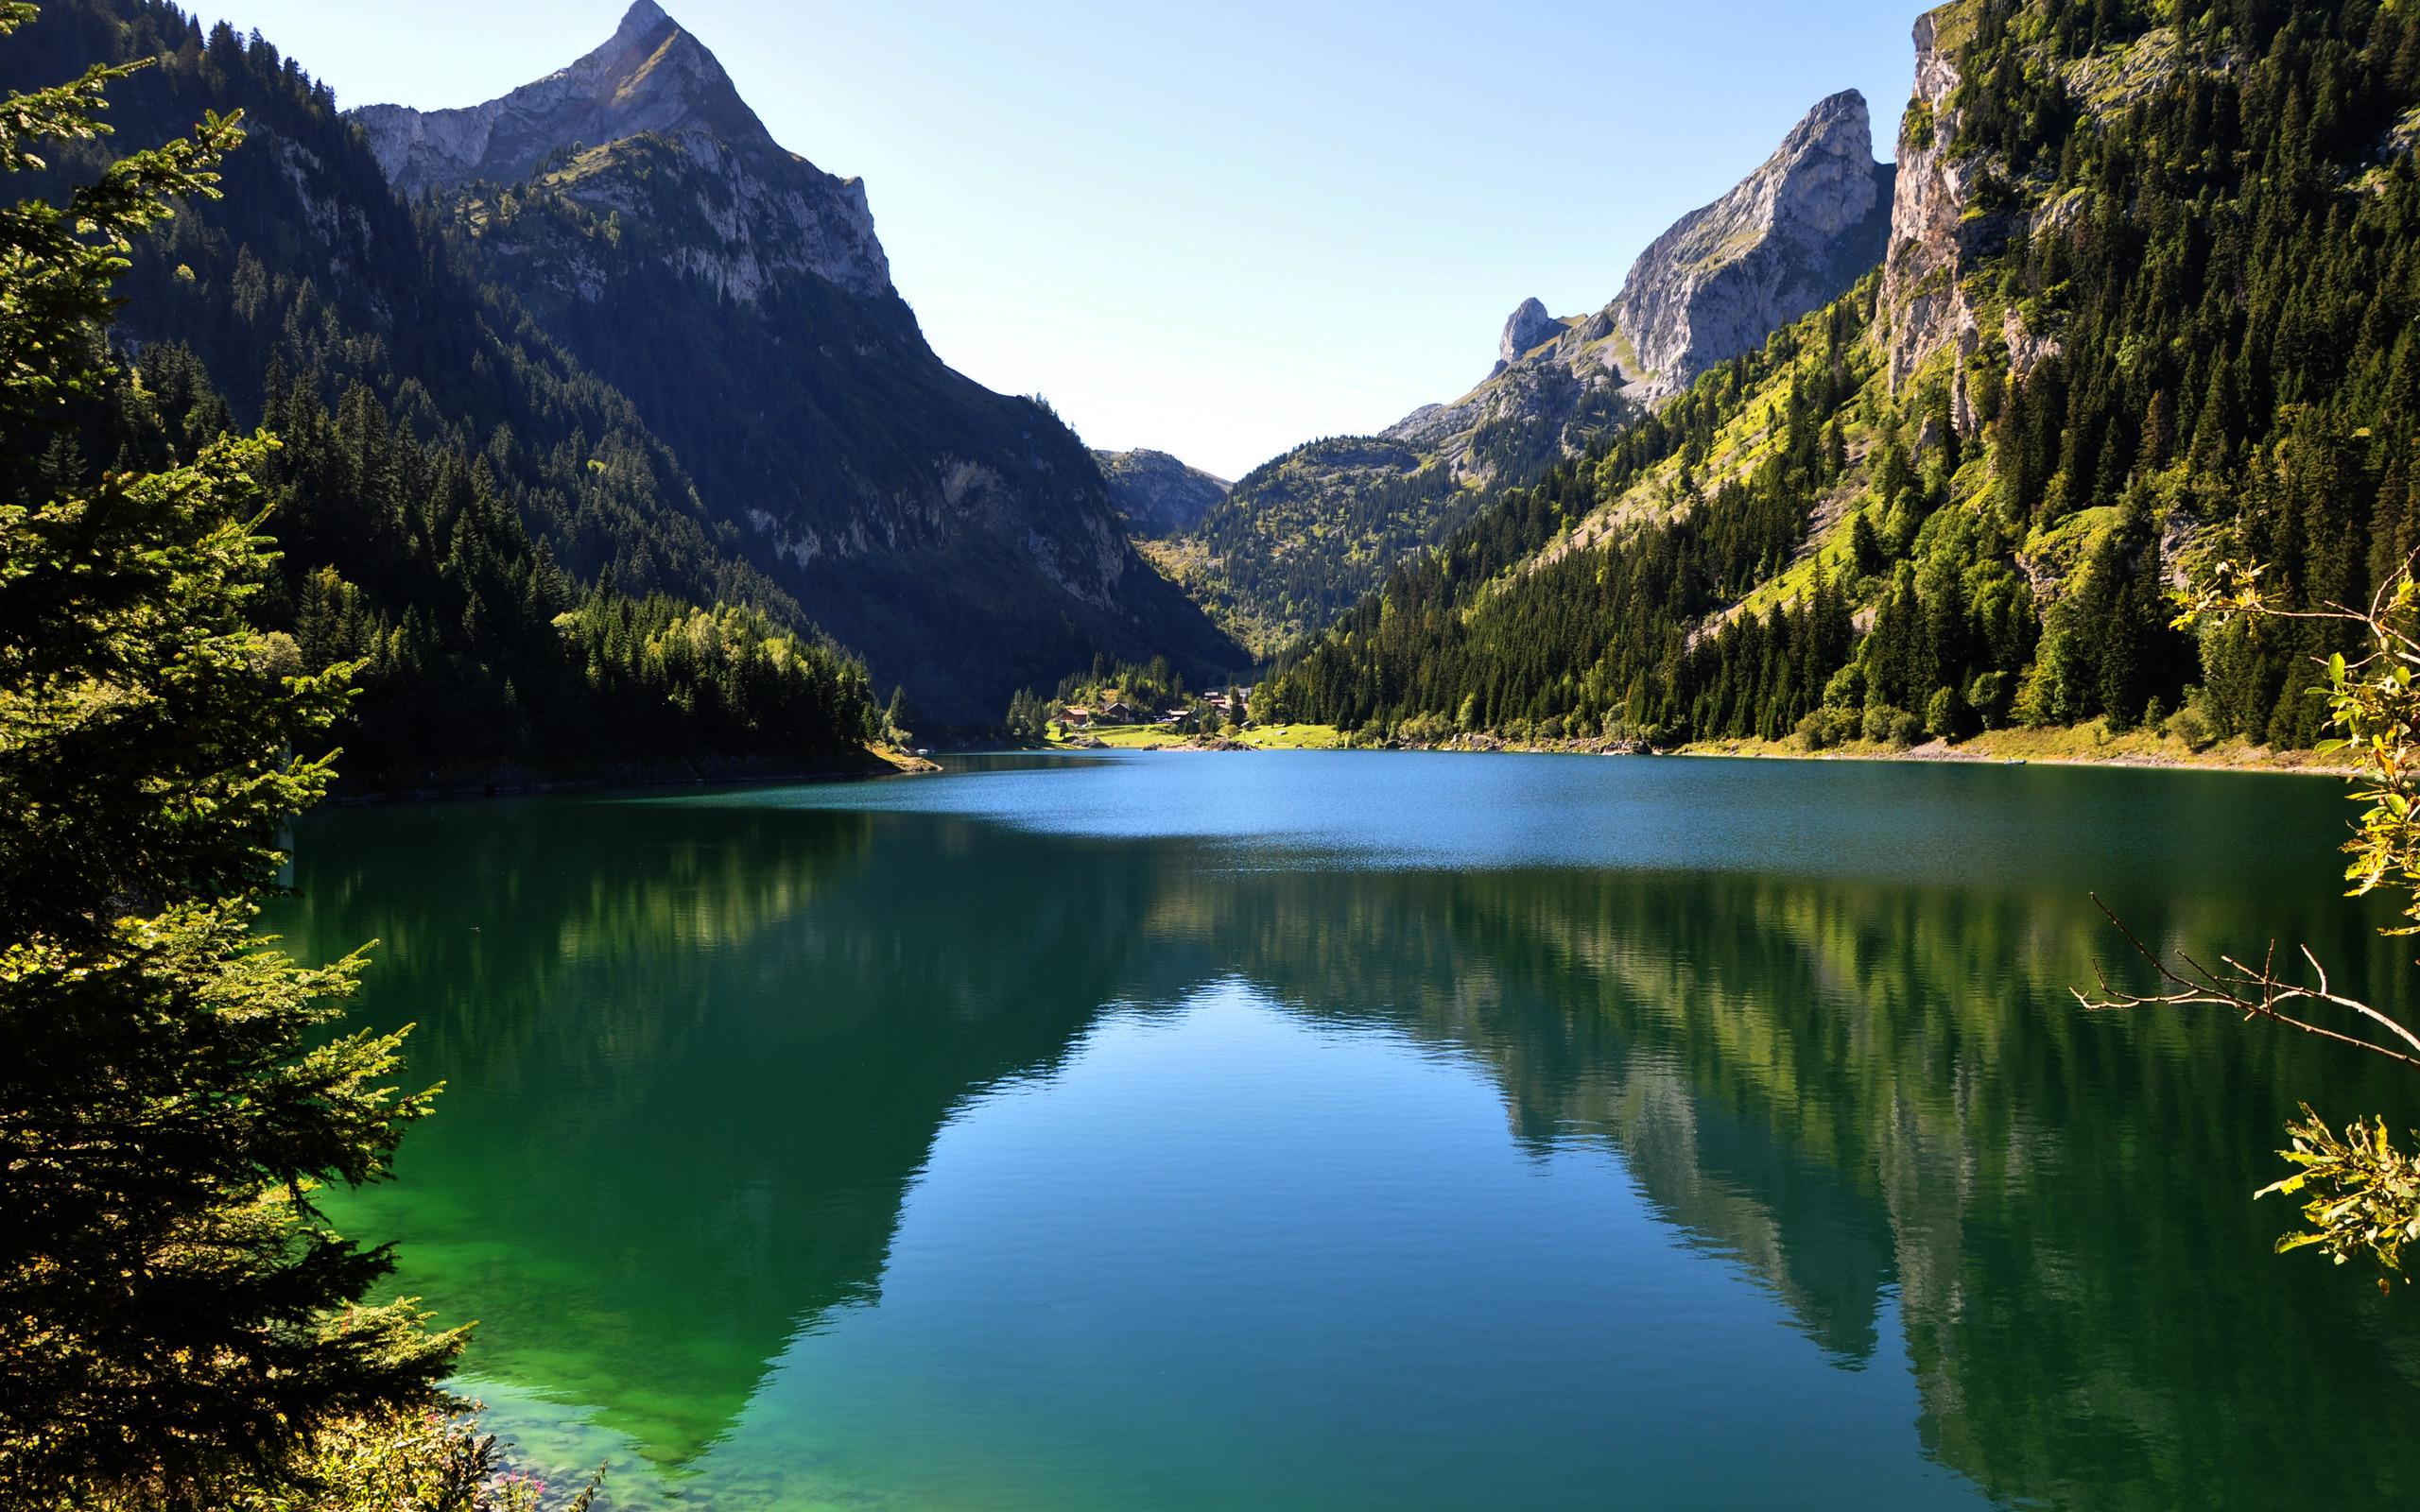 Hd wallpaper mountains - Green Mountain Wallpapers Cool Wallpaper Hd